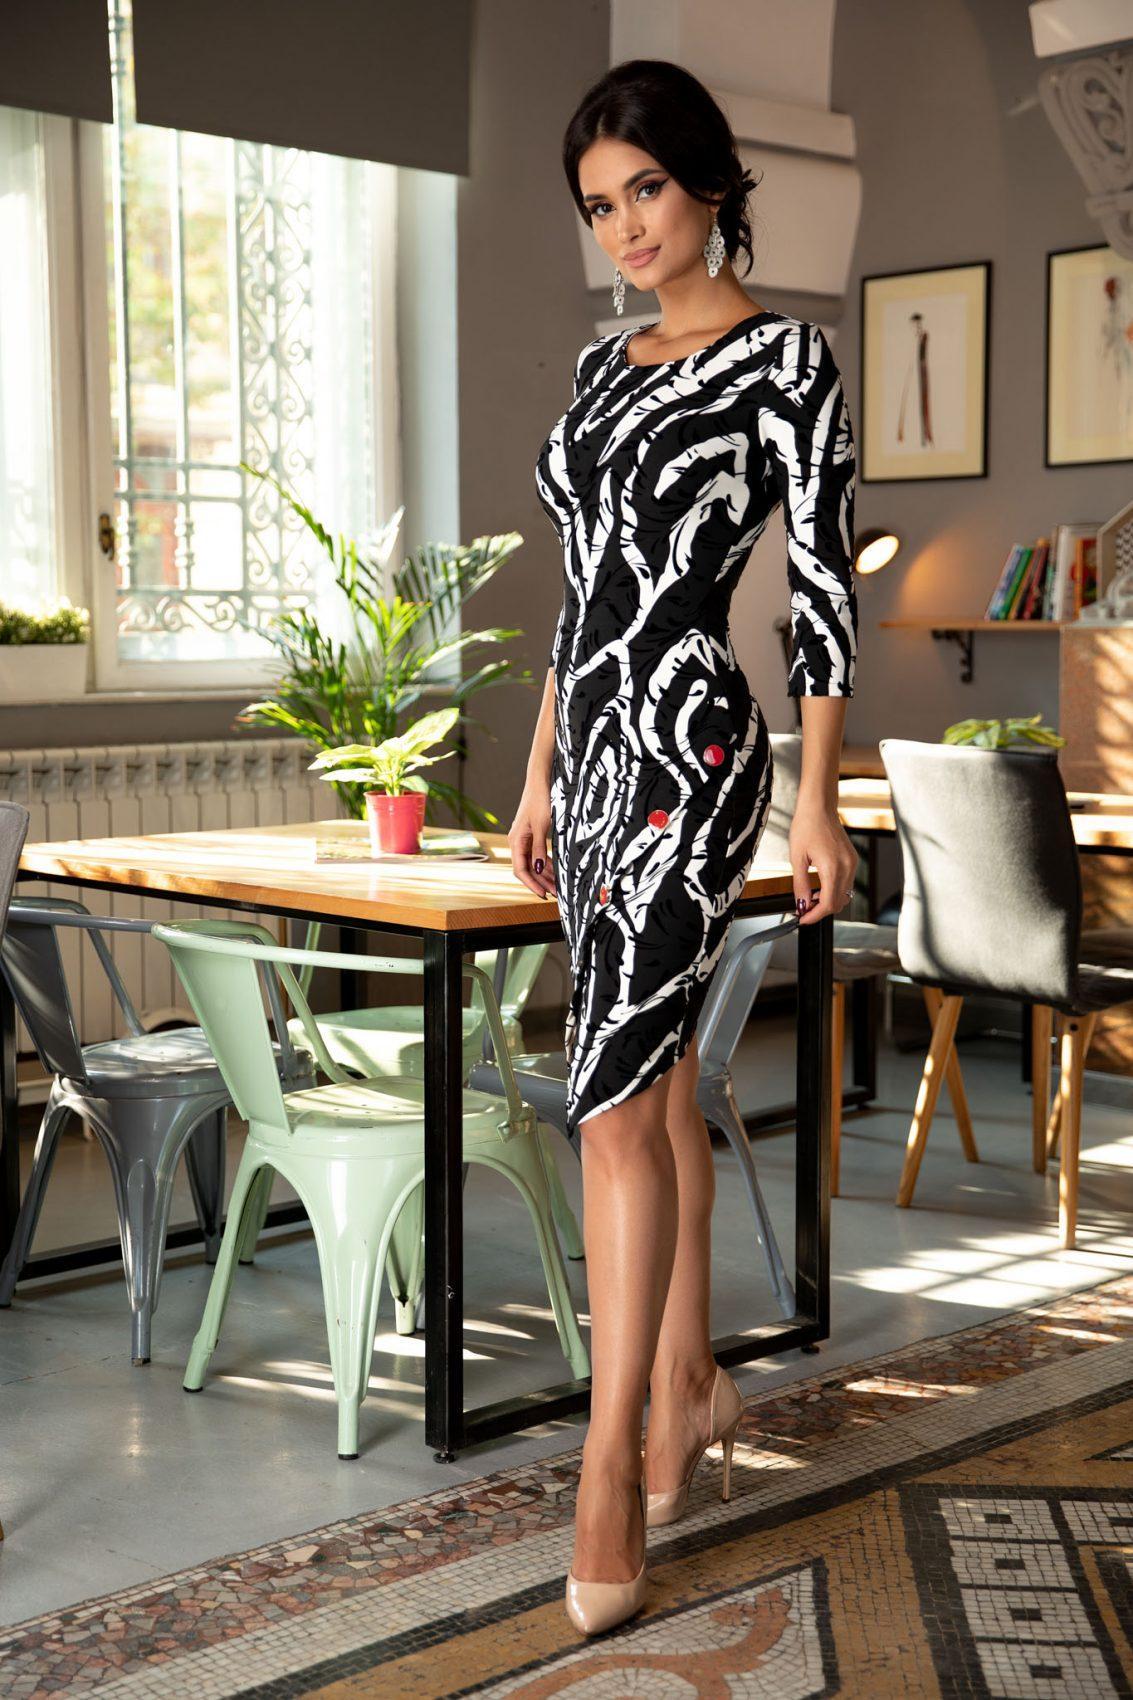 Kaylee Midi Ασπρόμαυρο Φόρεμα 5385